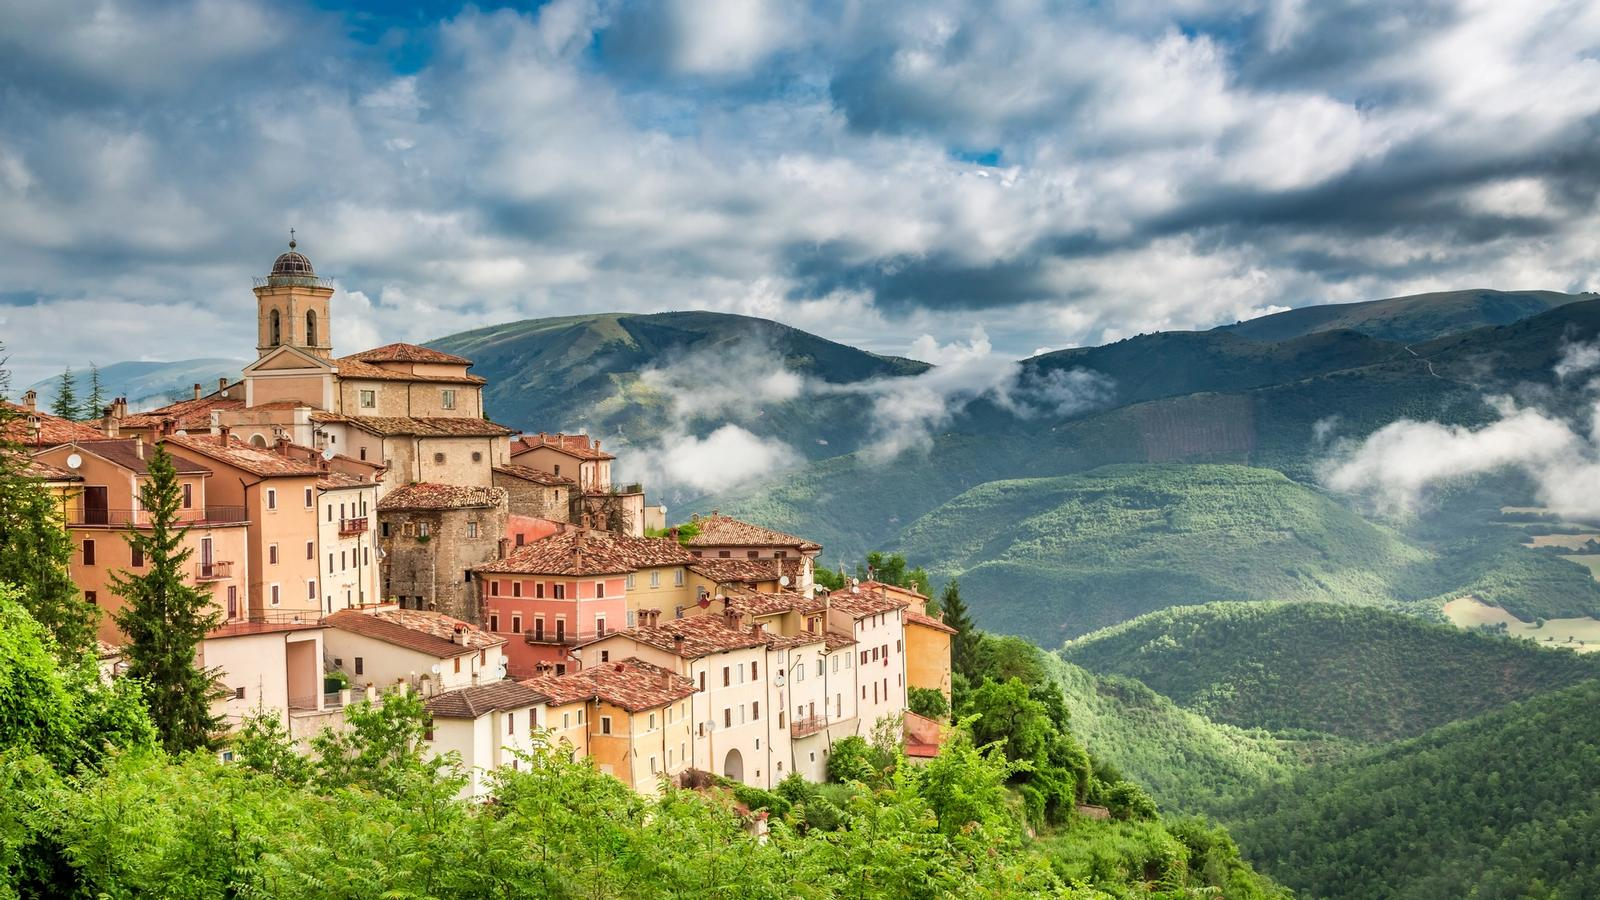 Borgo Medievale Umbro